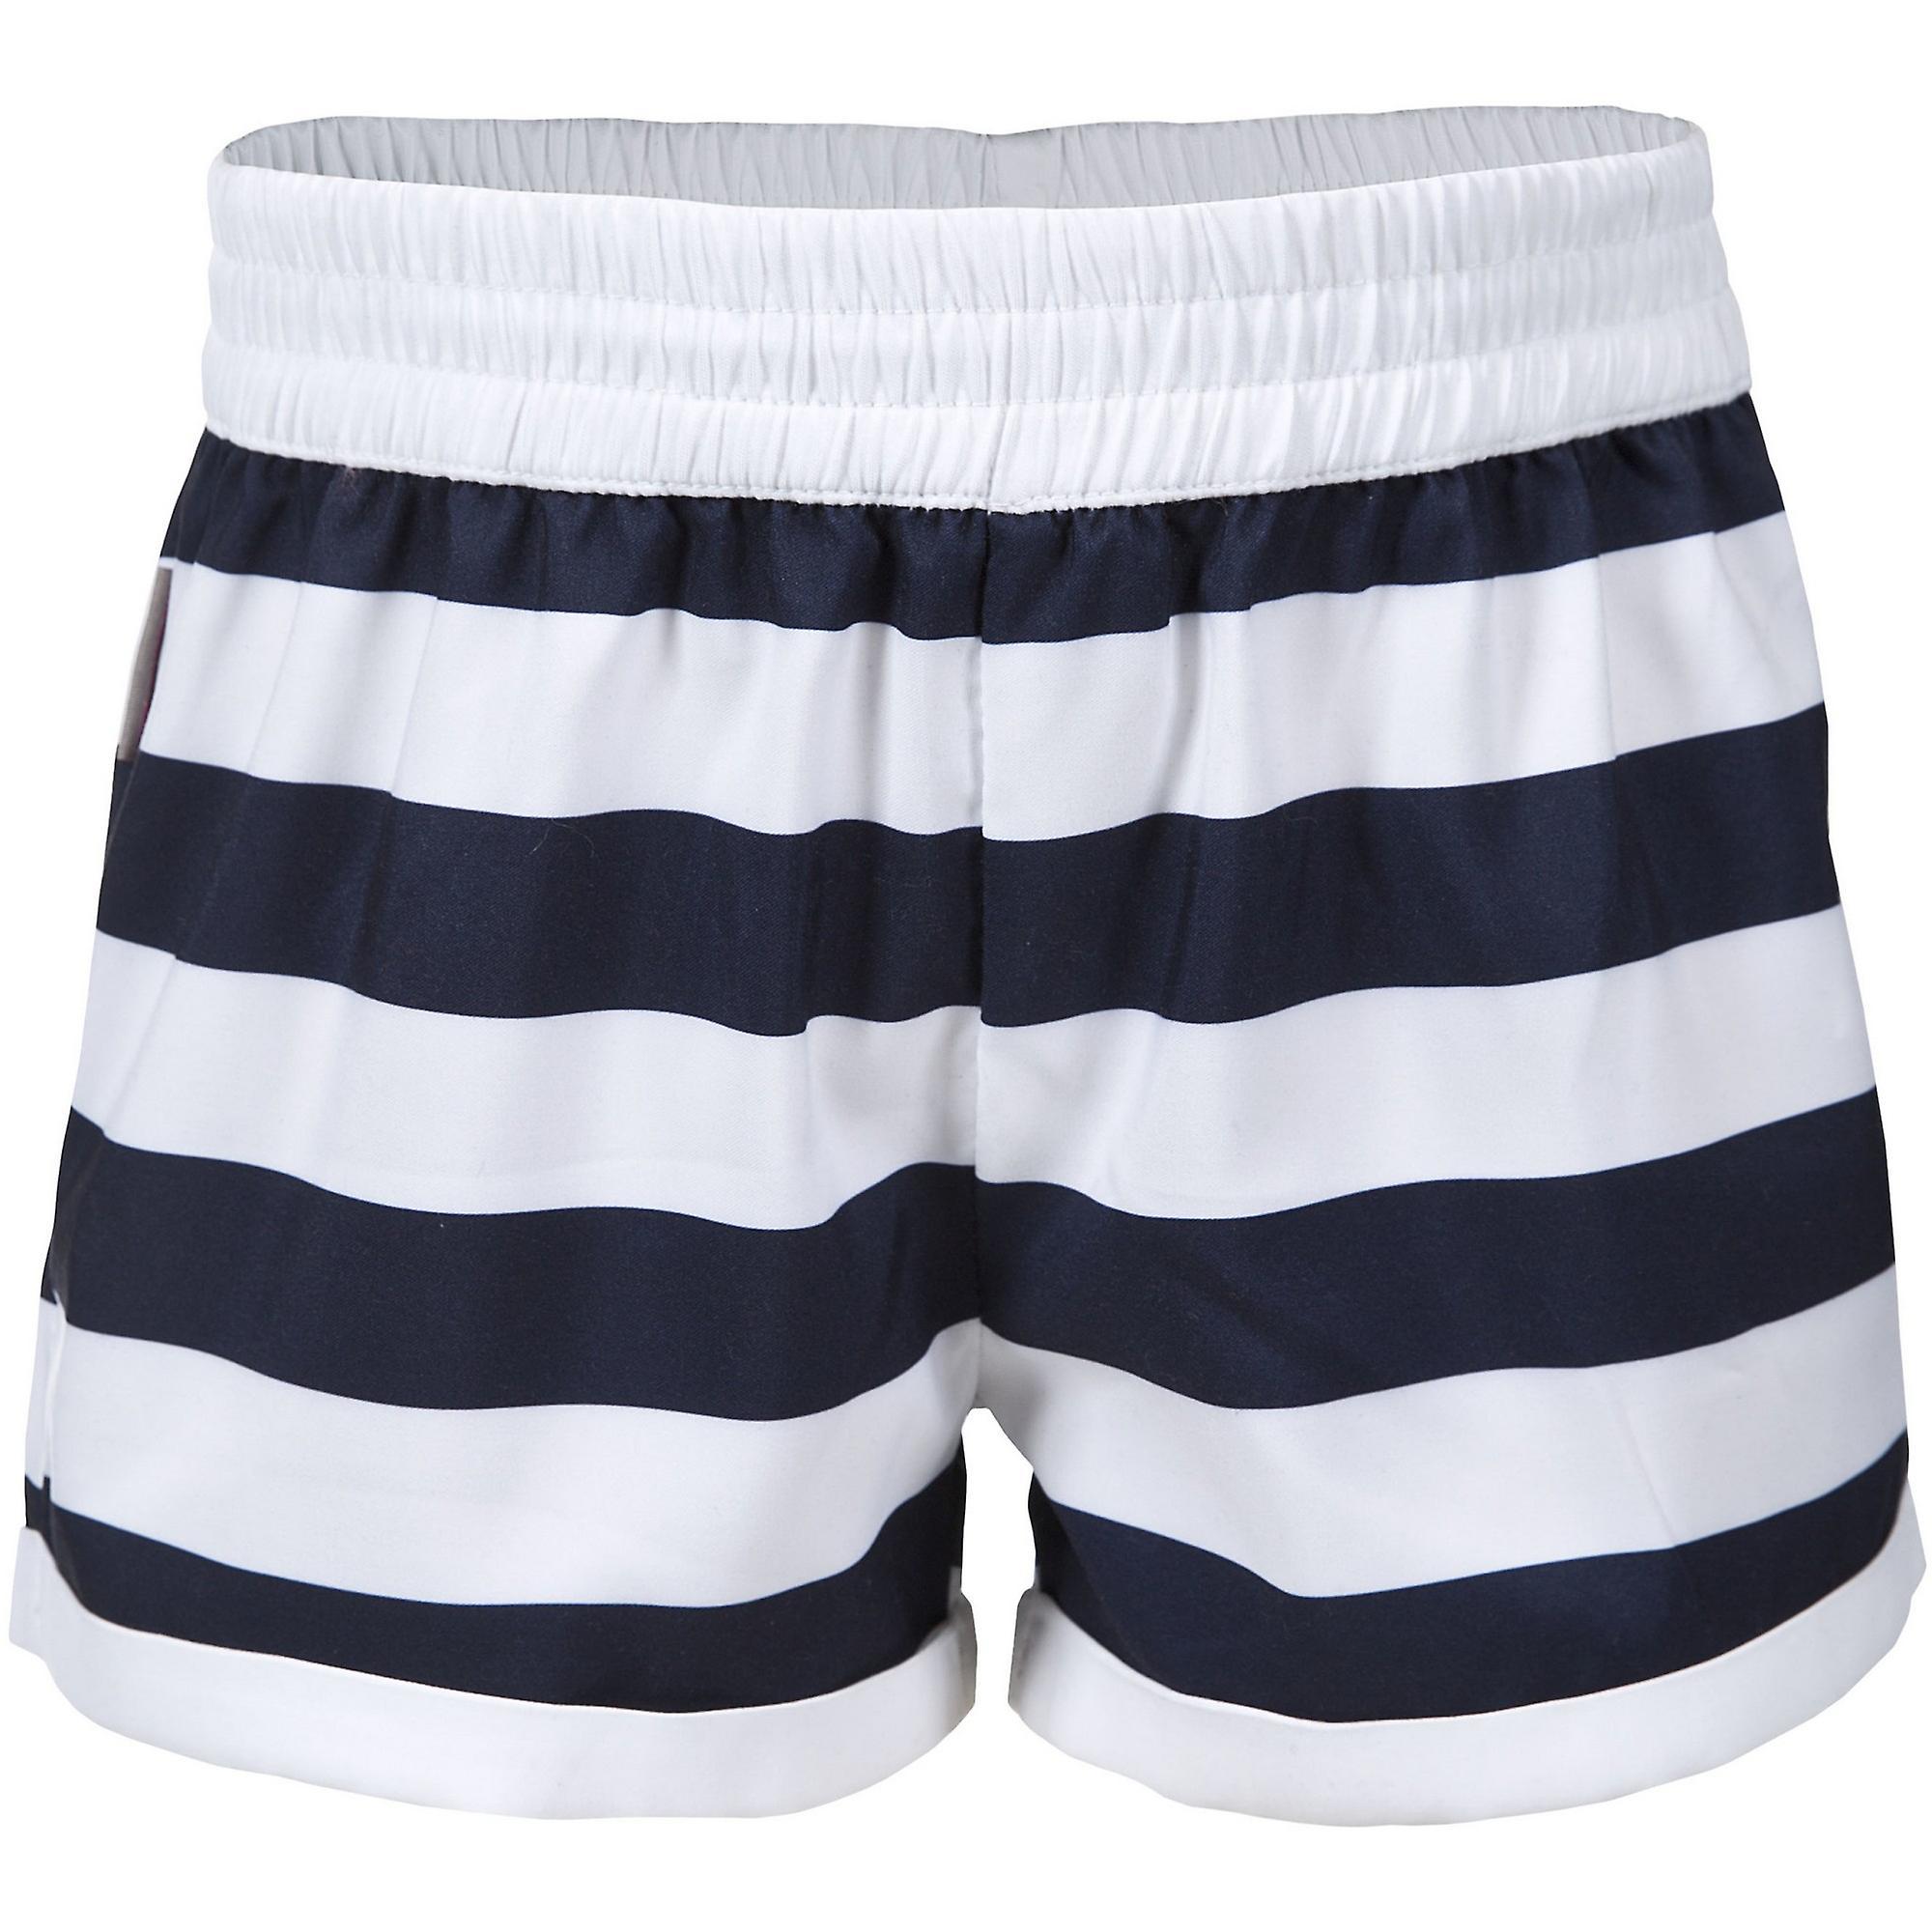 Trespass Childrens Girls Wini Summer Shorts